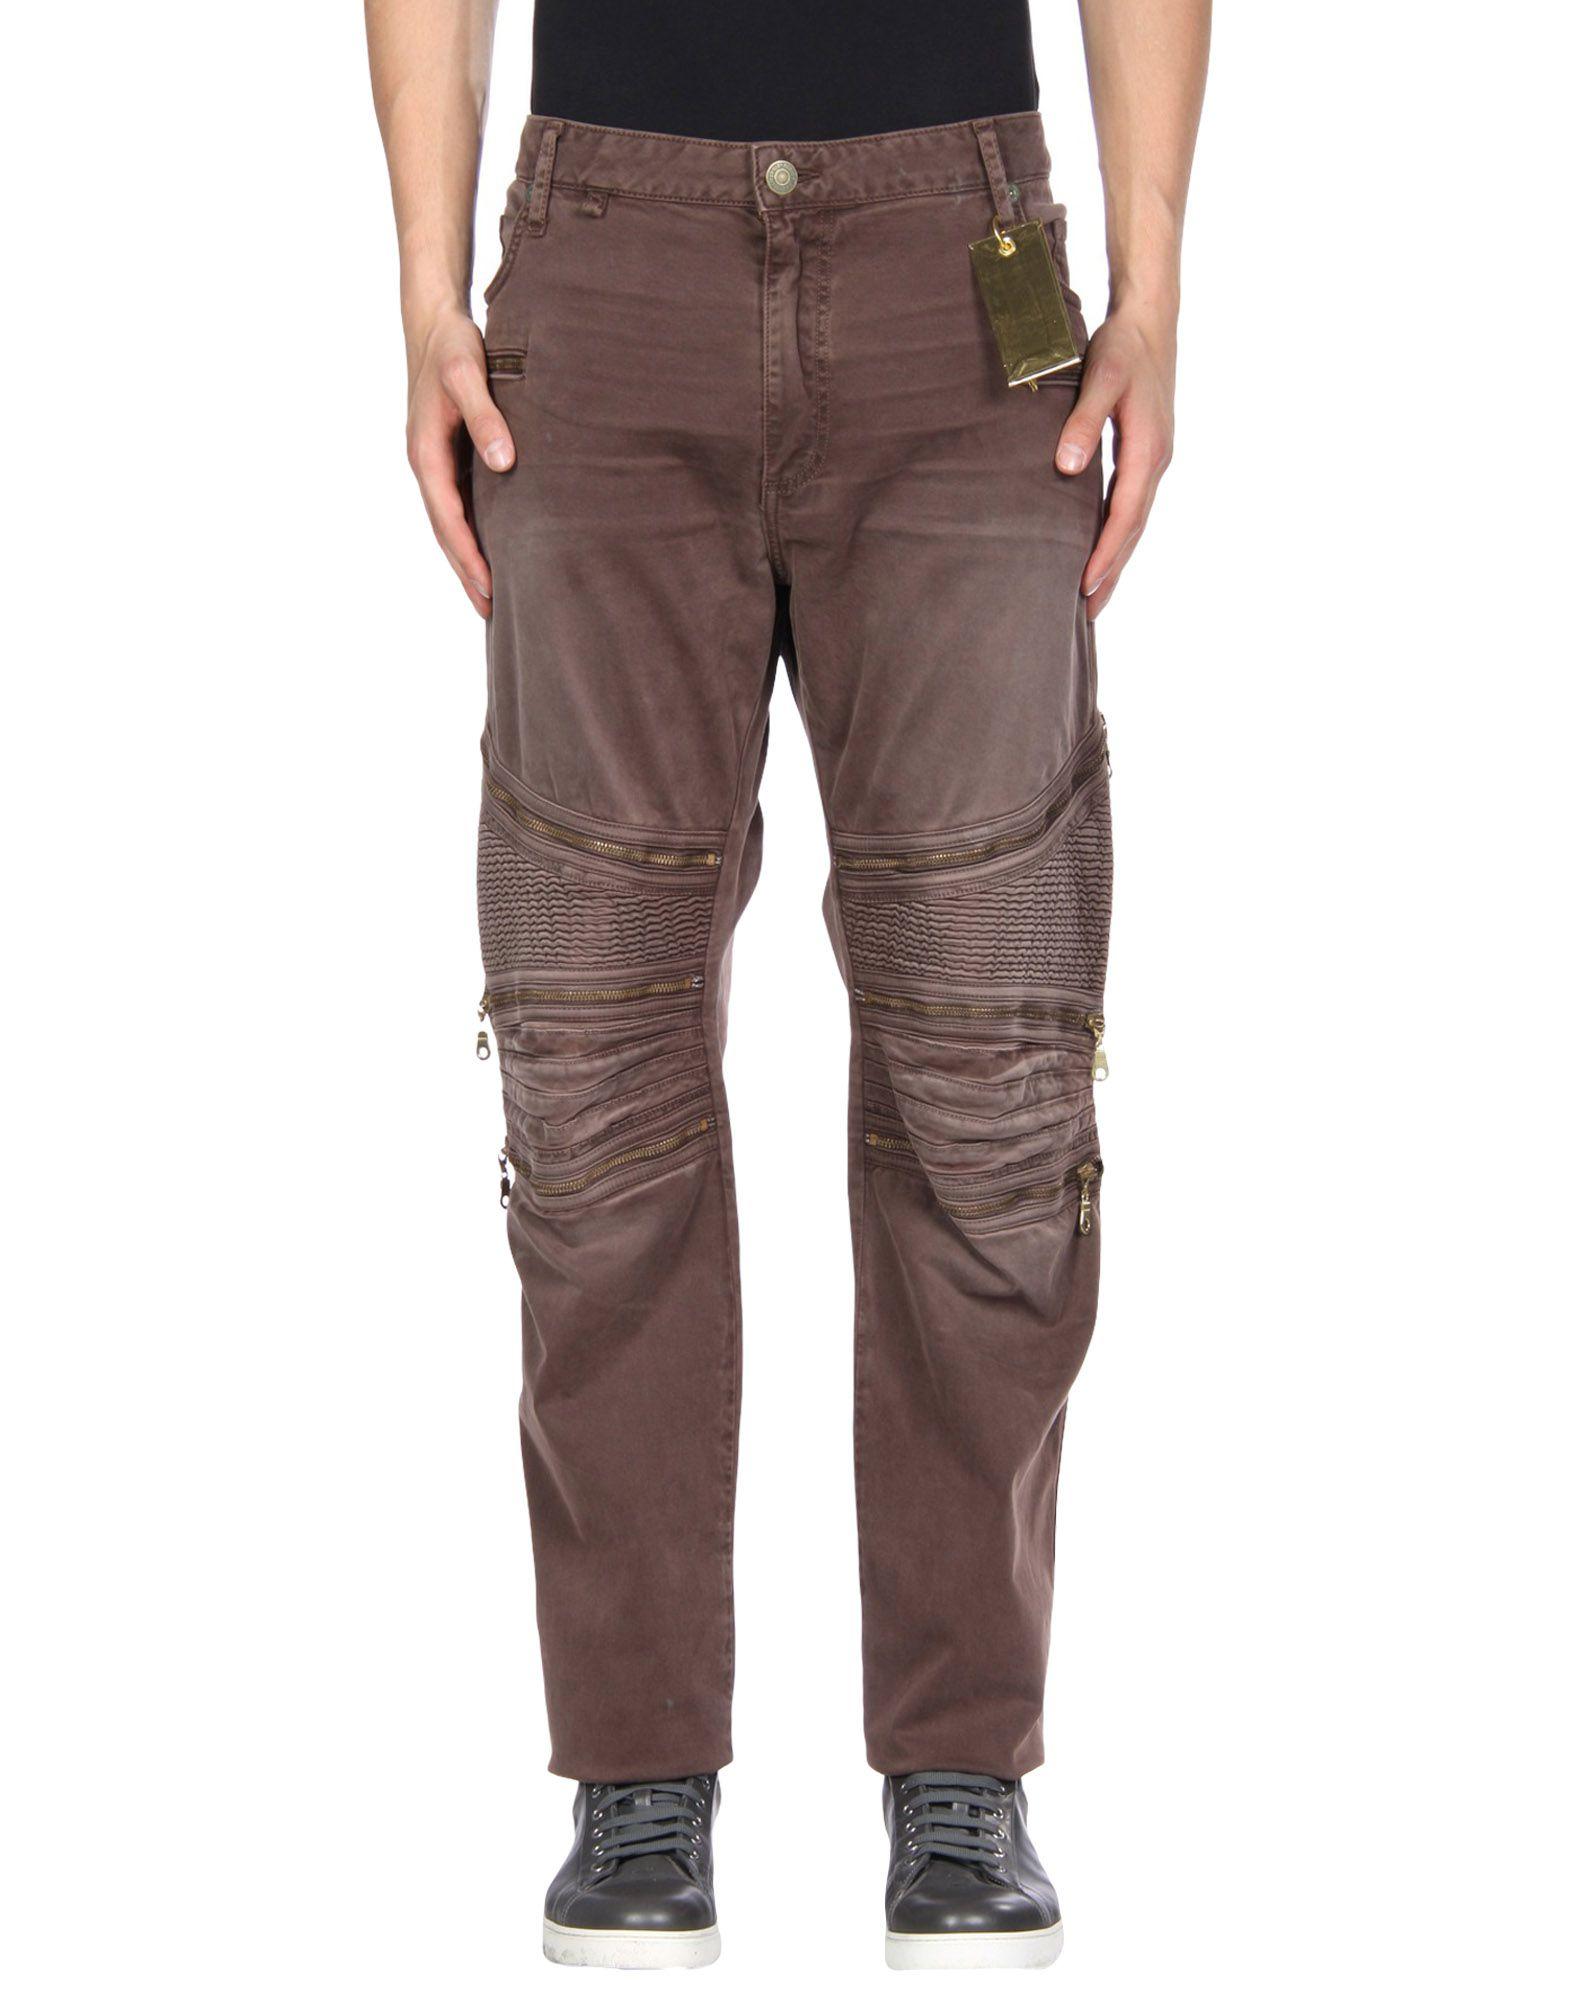 ROBIN'S JEAN Casual Pants in Brown